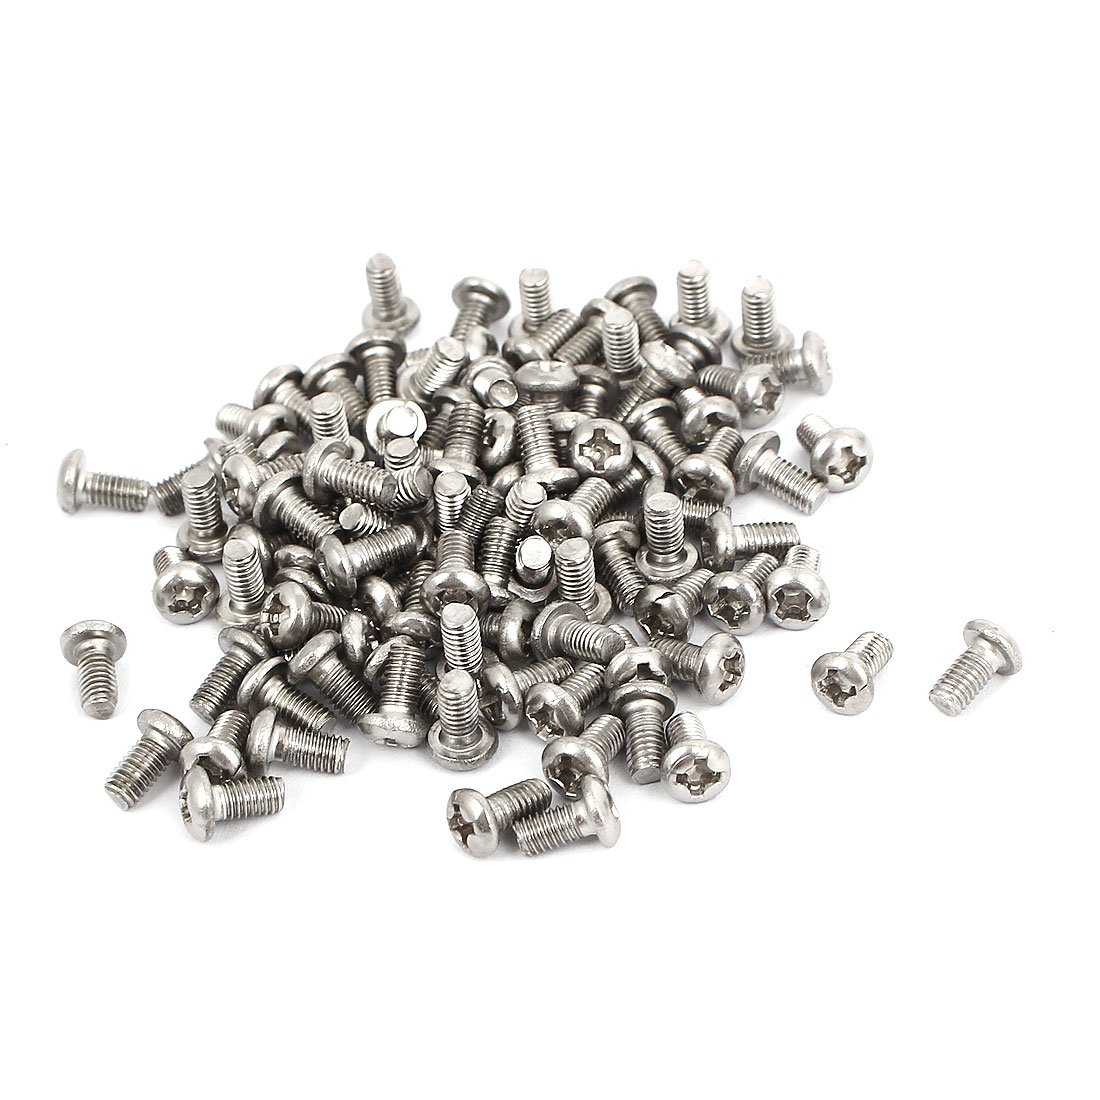 M 3 x 5 mm cabeza redonda acero inoxidable Phillips tornillos 100 piezas Sourcingmap a15121600ux0532